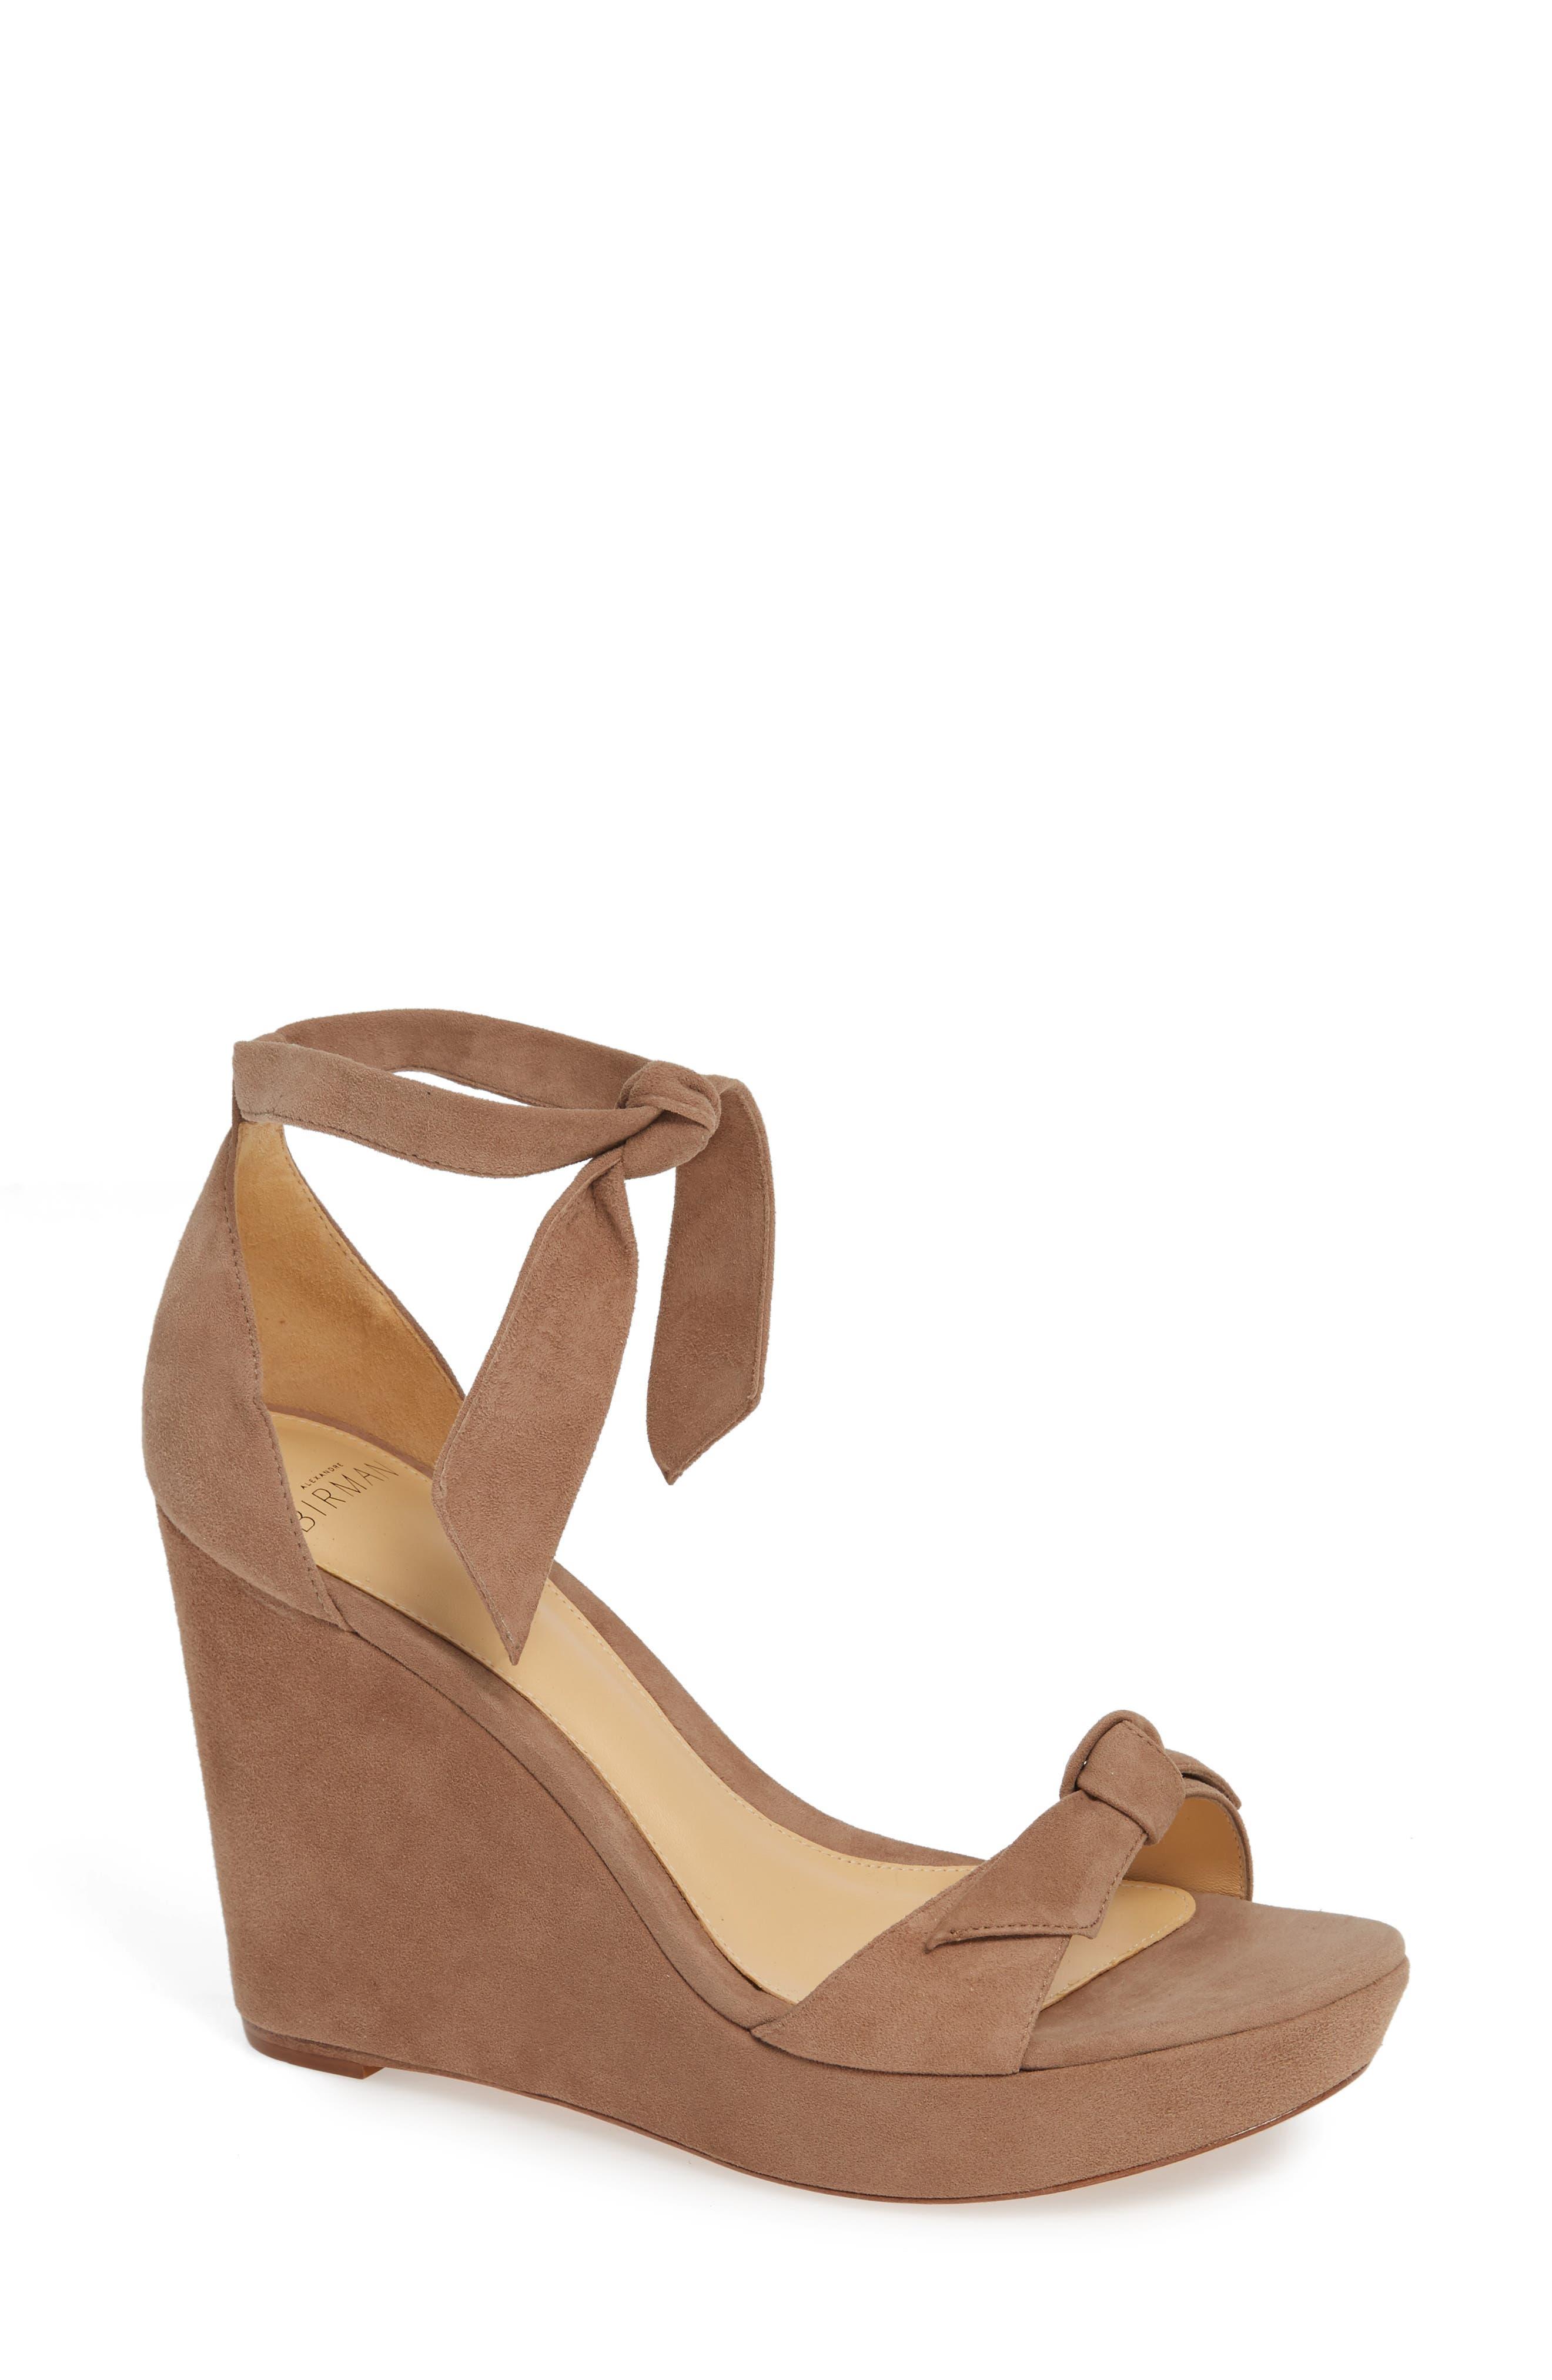 Clarita Platform Wedge Sandal, Main, color, CAMEO SUEDE